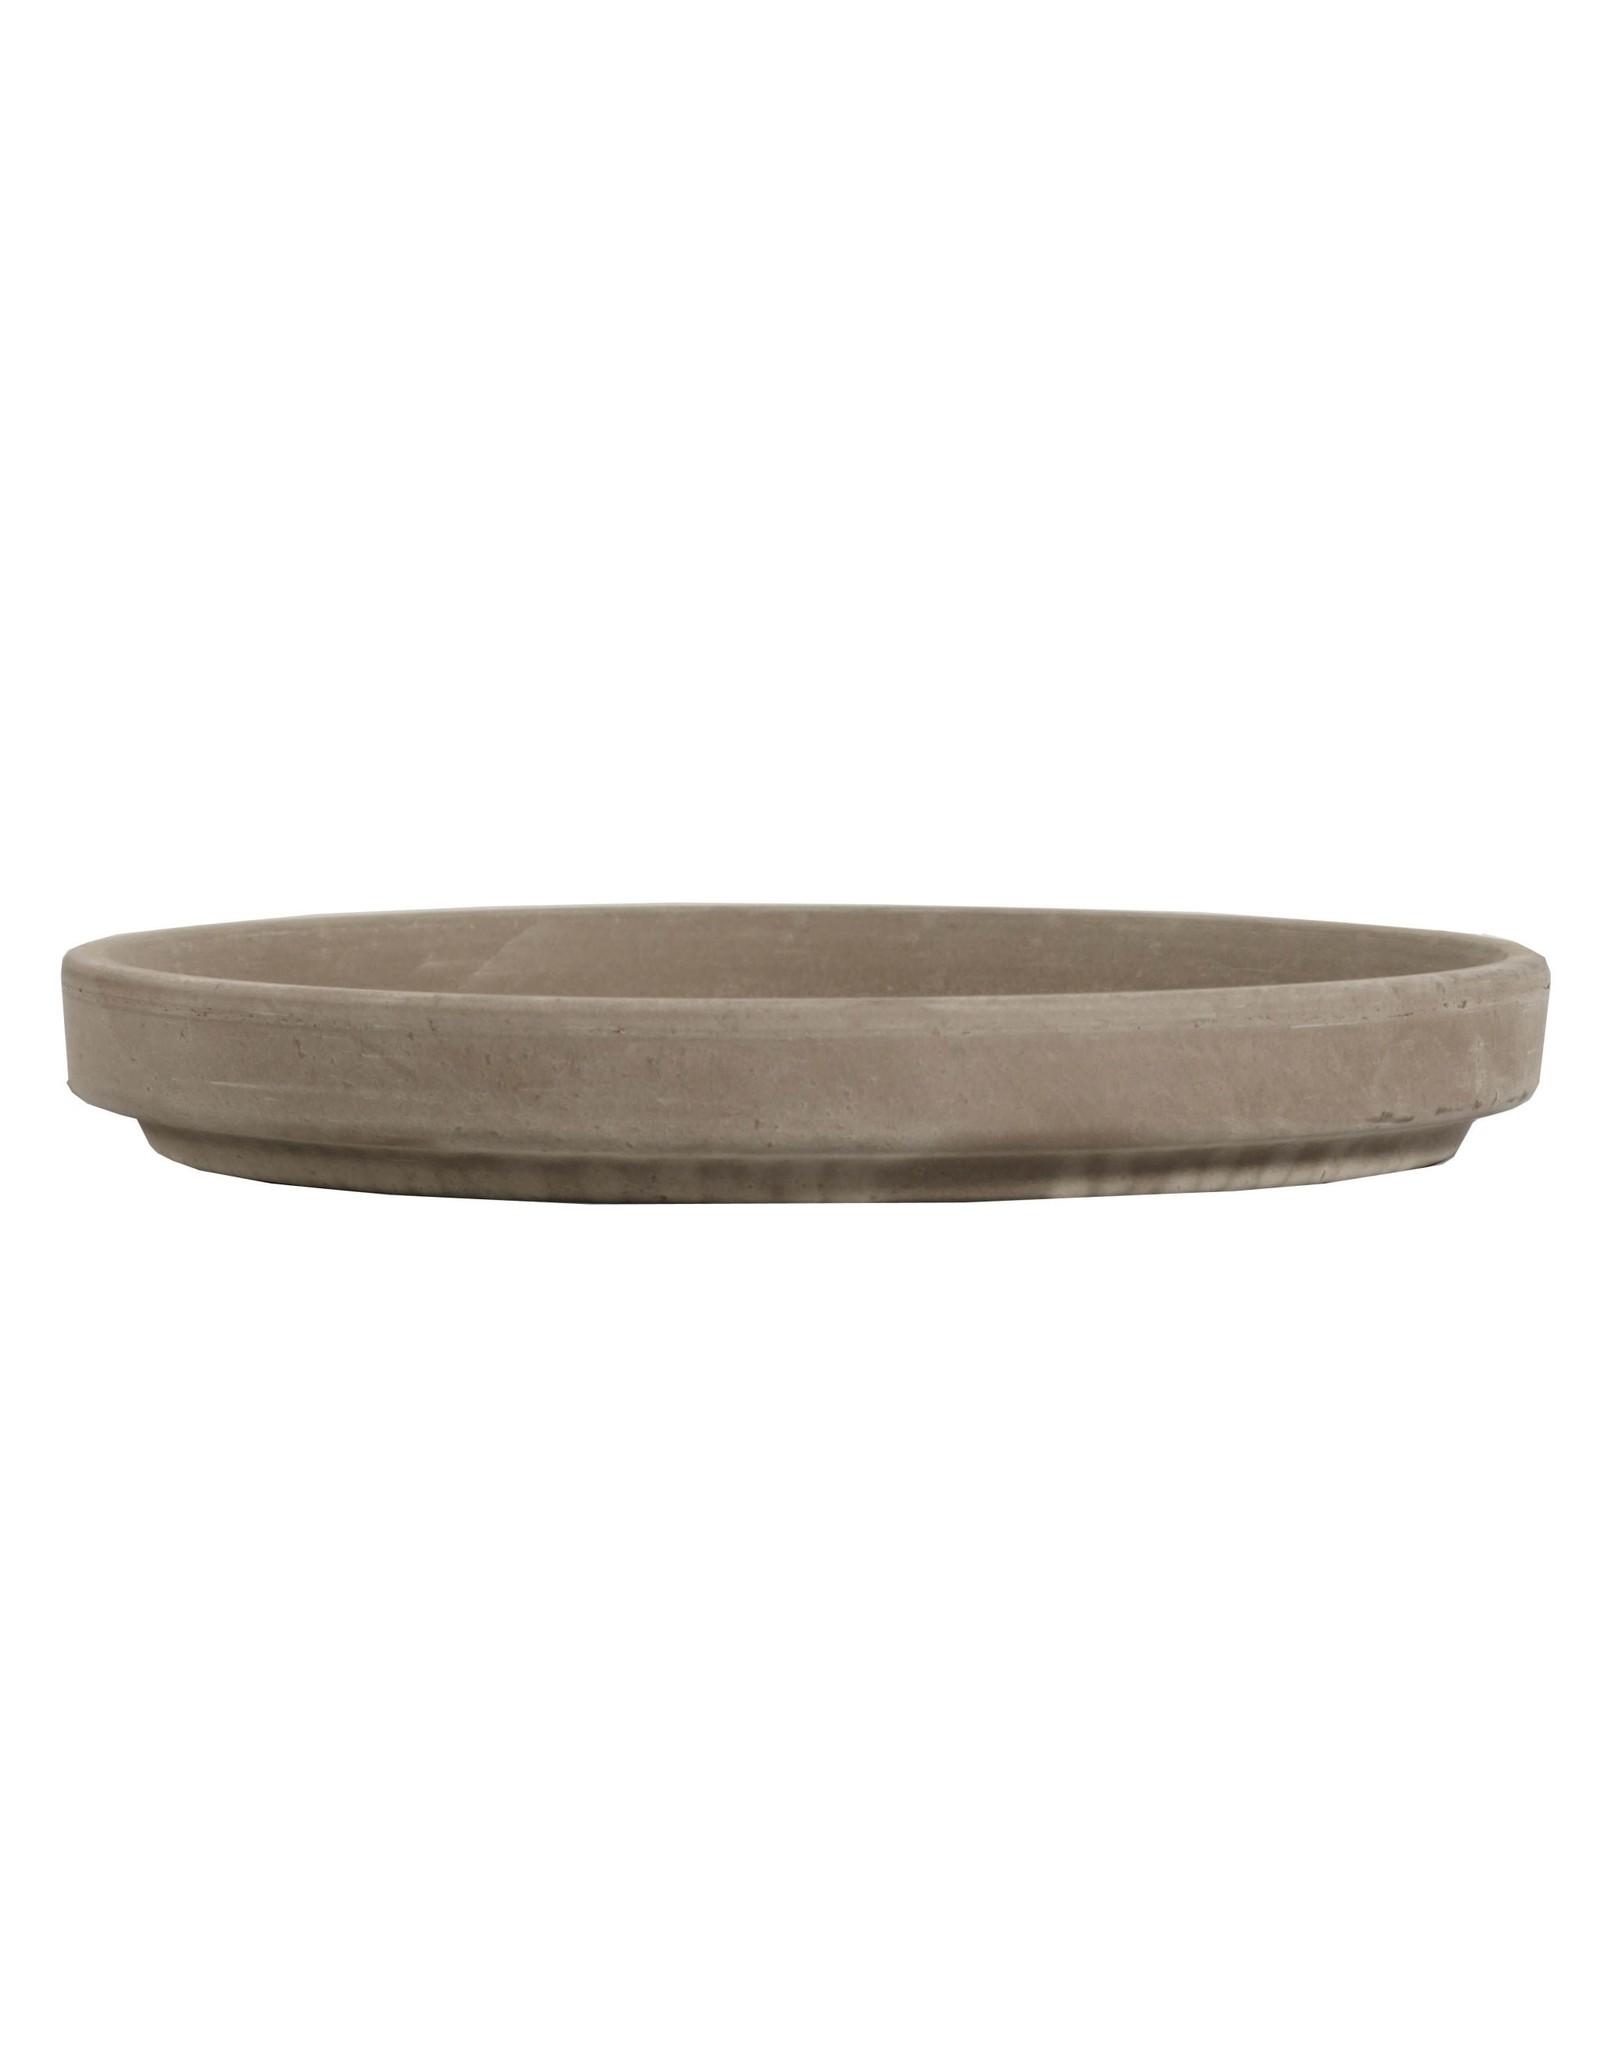 Terra Cotta Saucer - Gray Clay